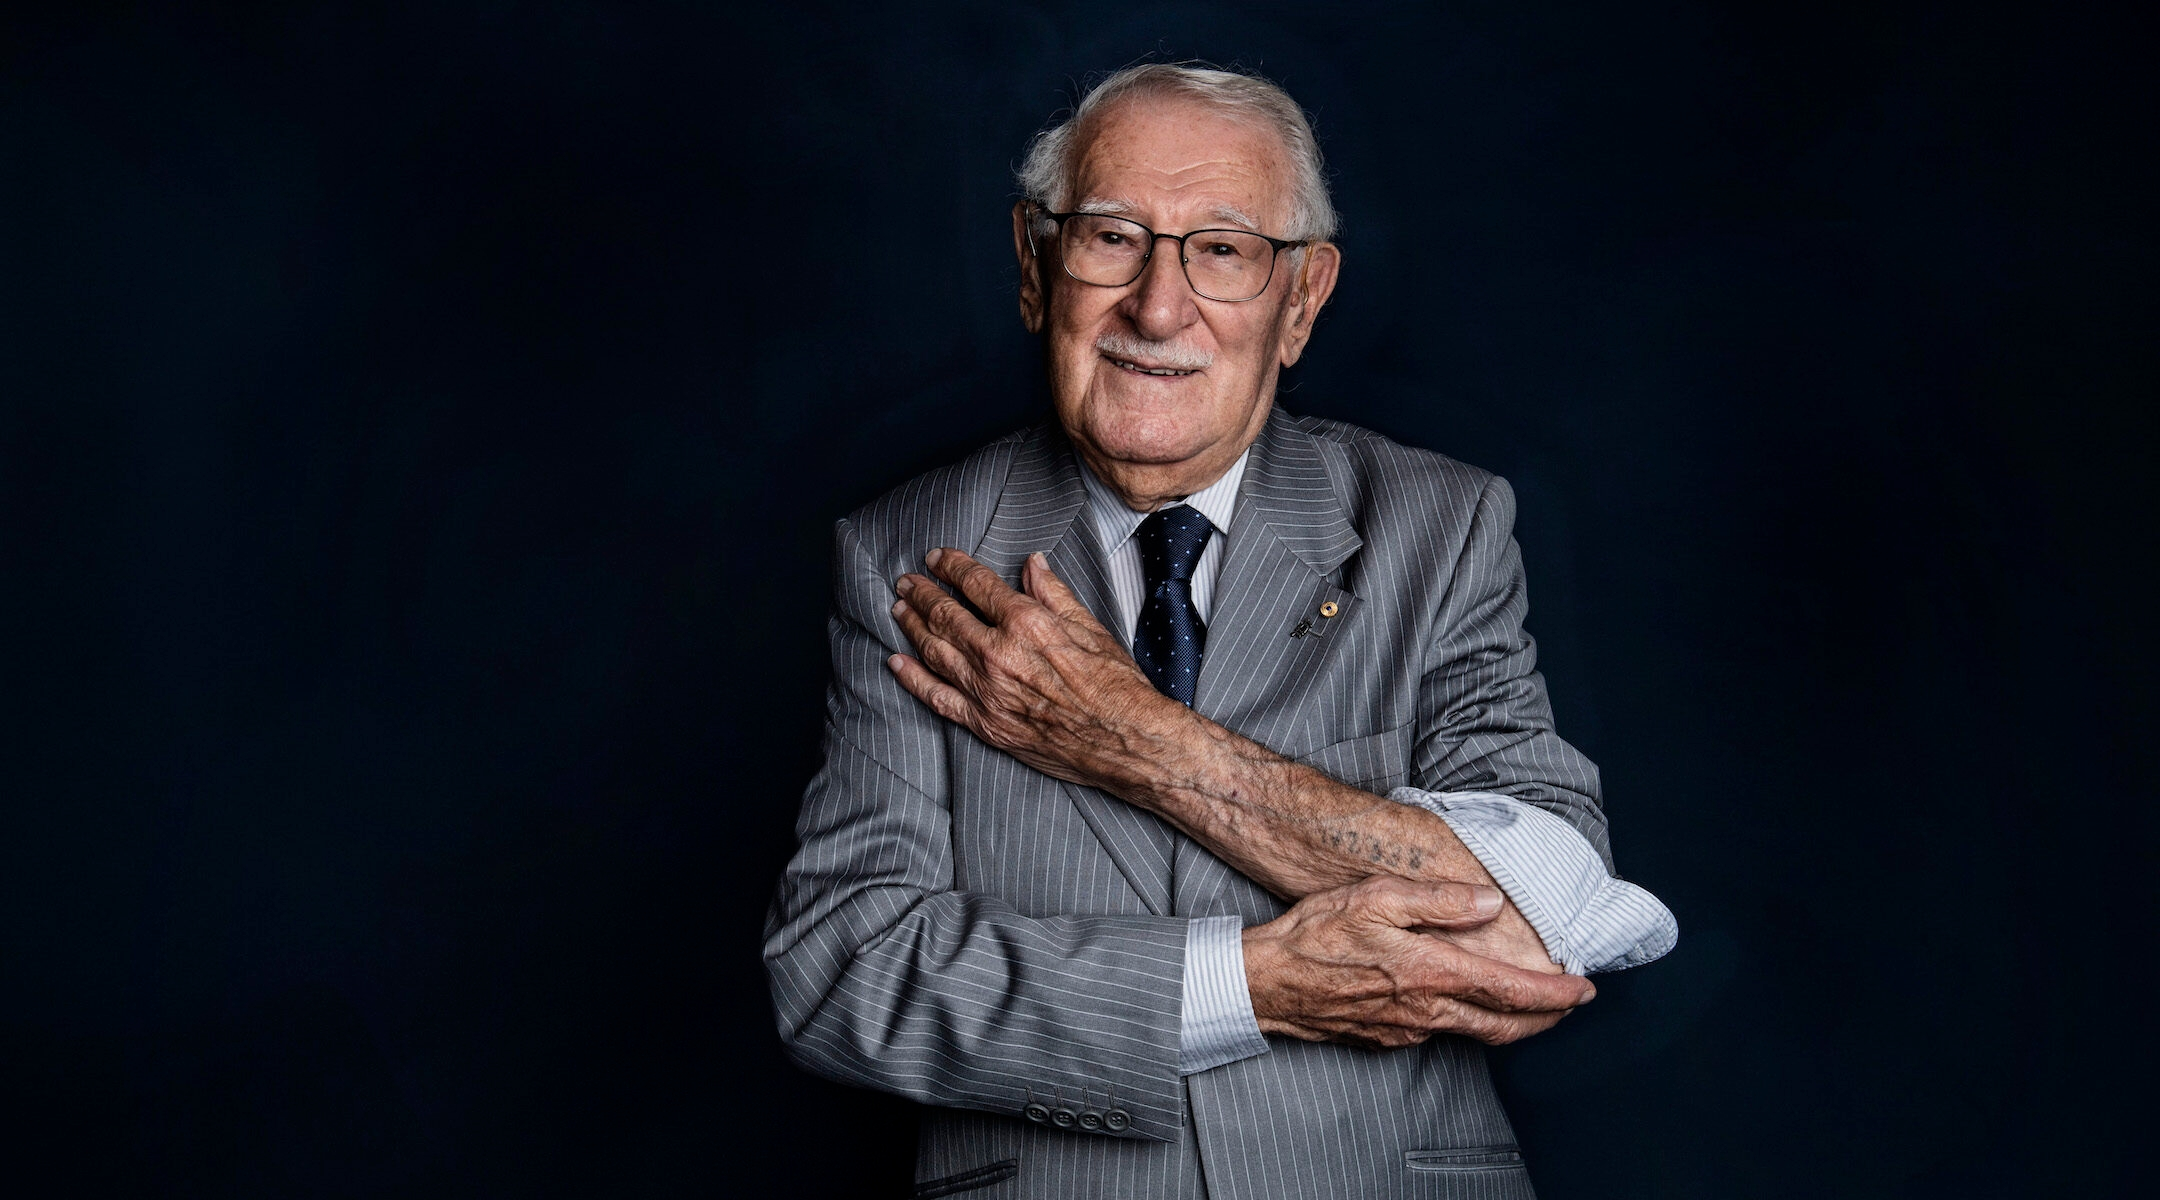 Holocaust survivor Eddie Jaku shows the concentration camp number tattoo on his left arm